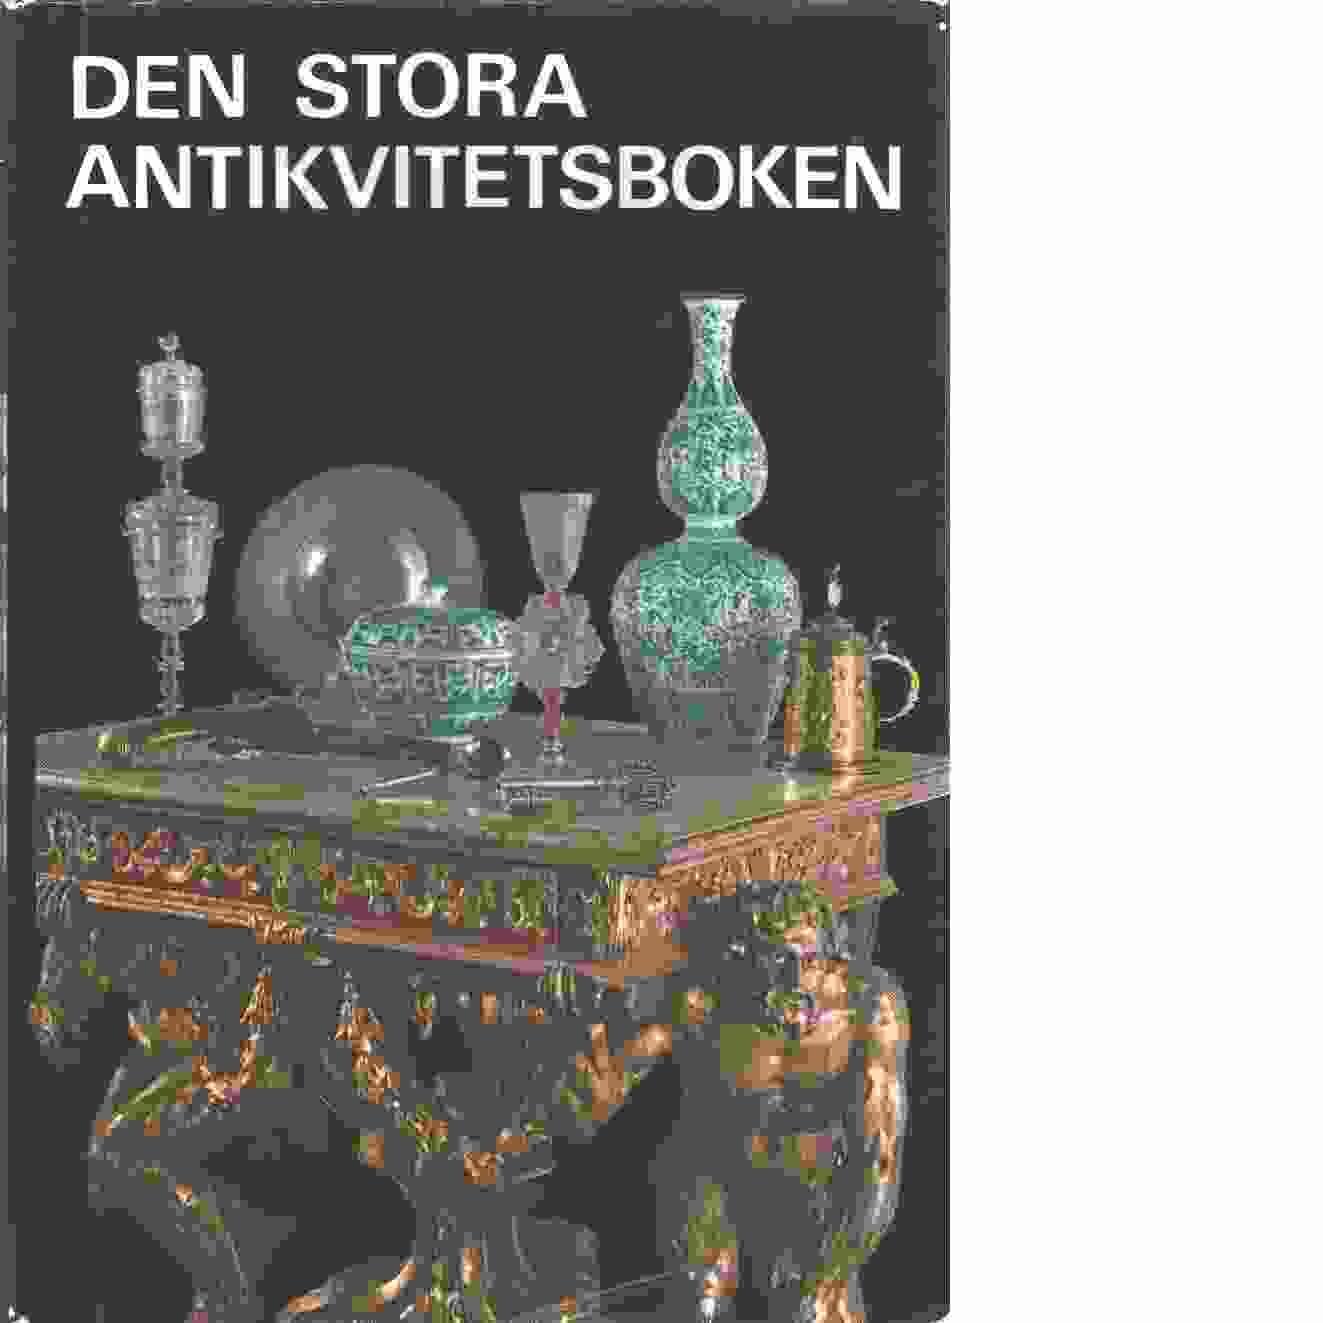 Den stora antikvitetsboken - Red.